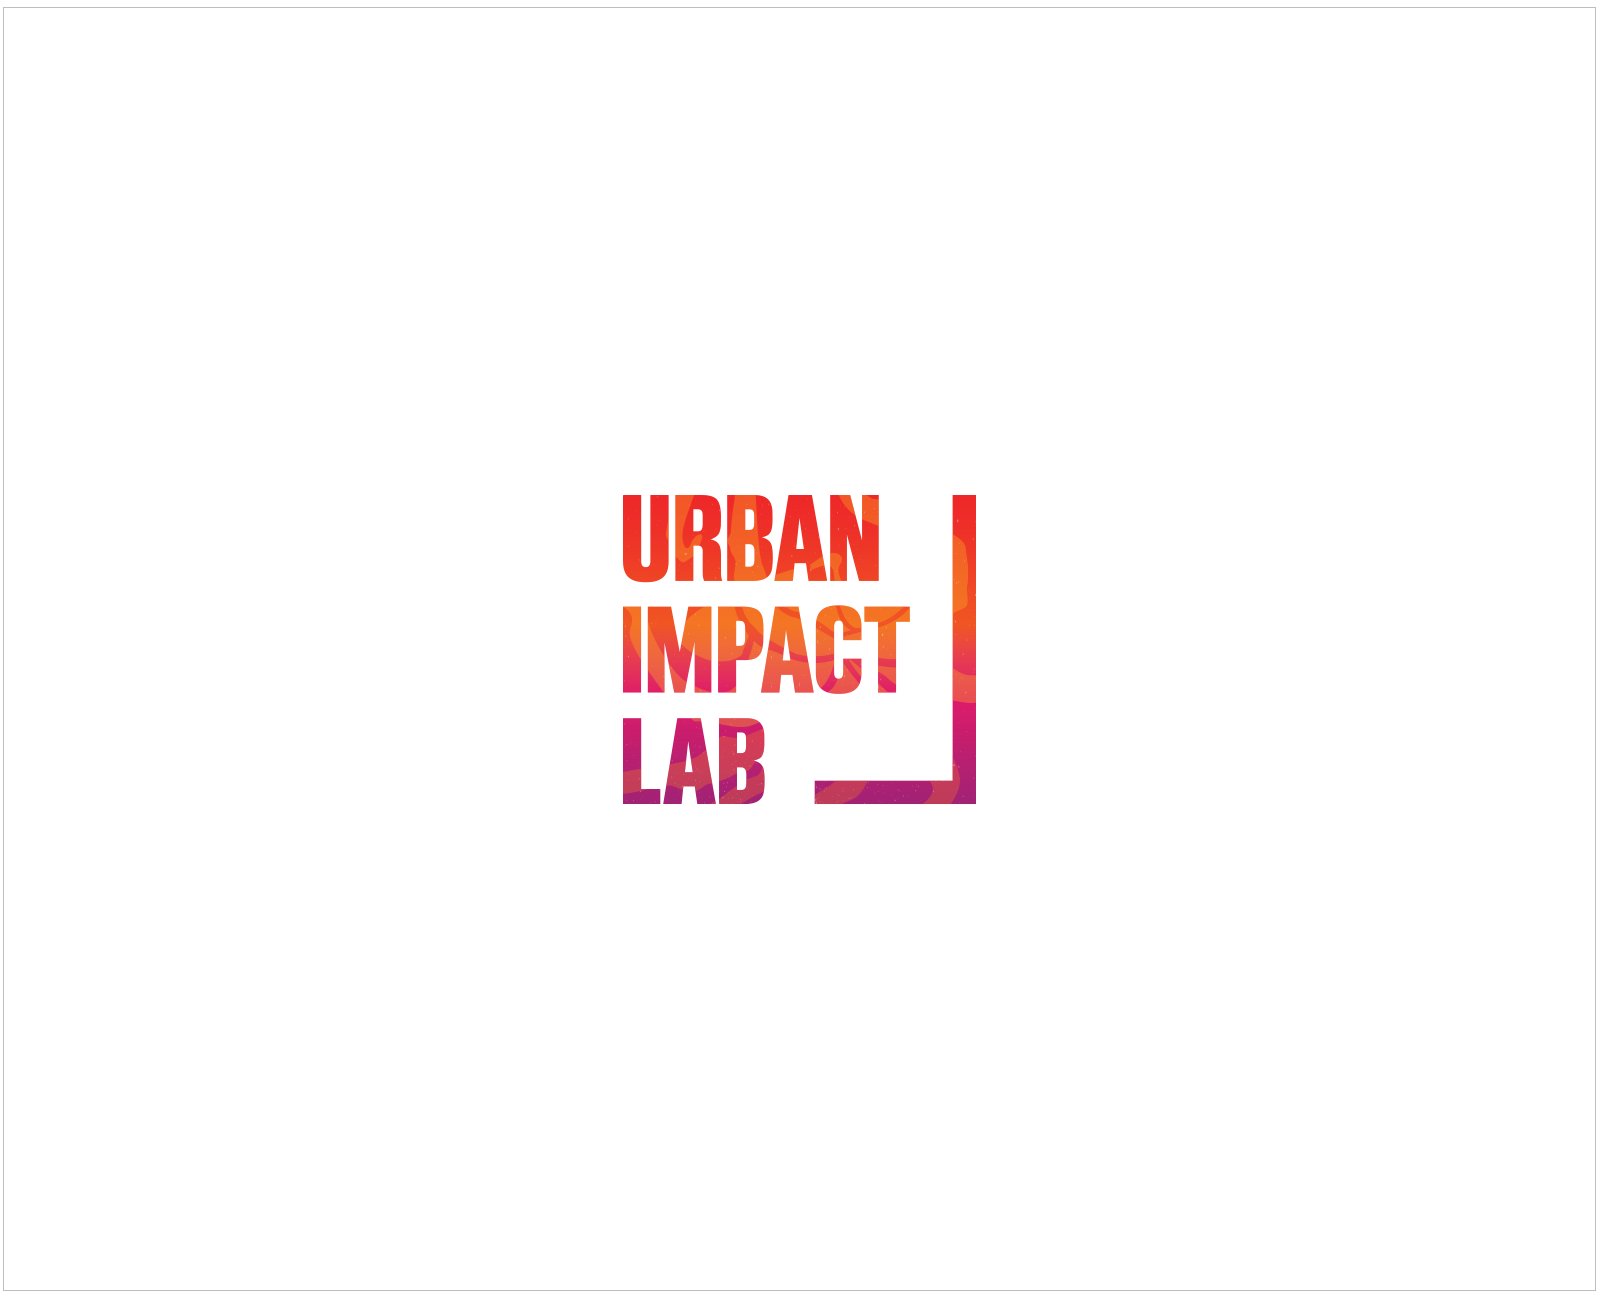 Urban Impact Lab logo in color